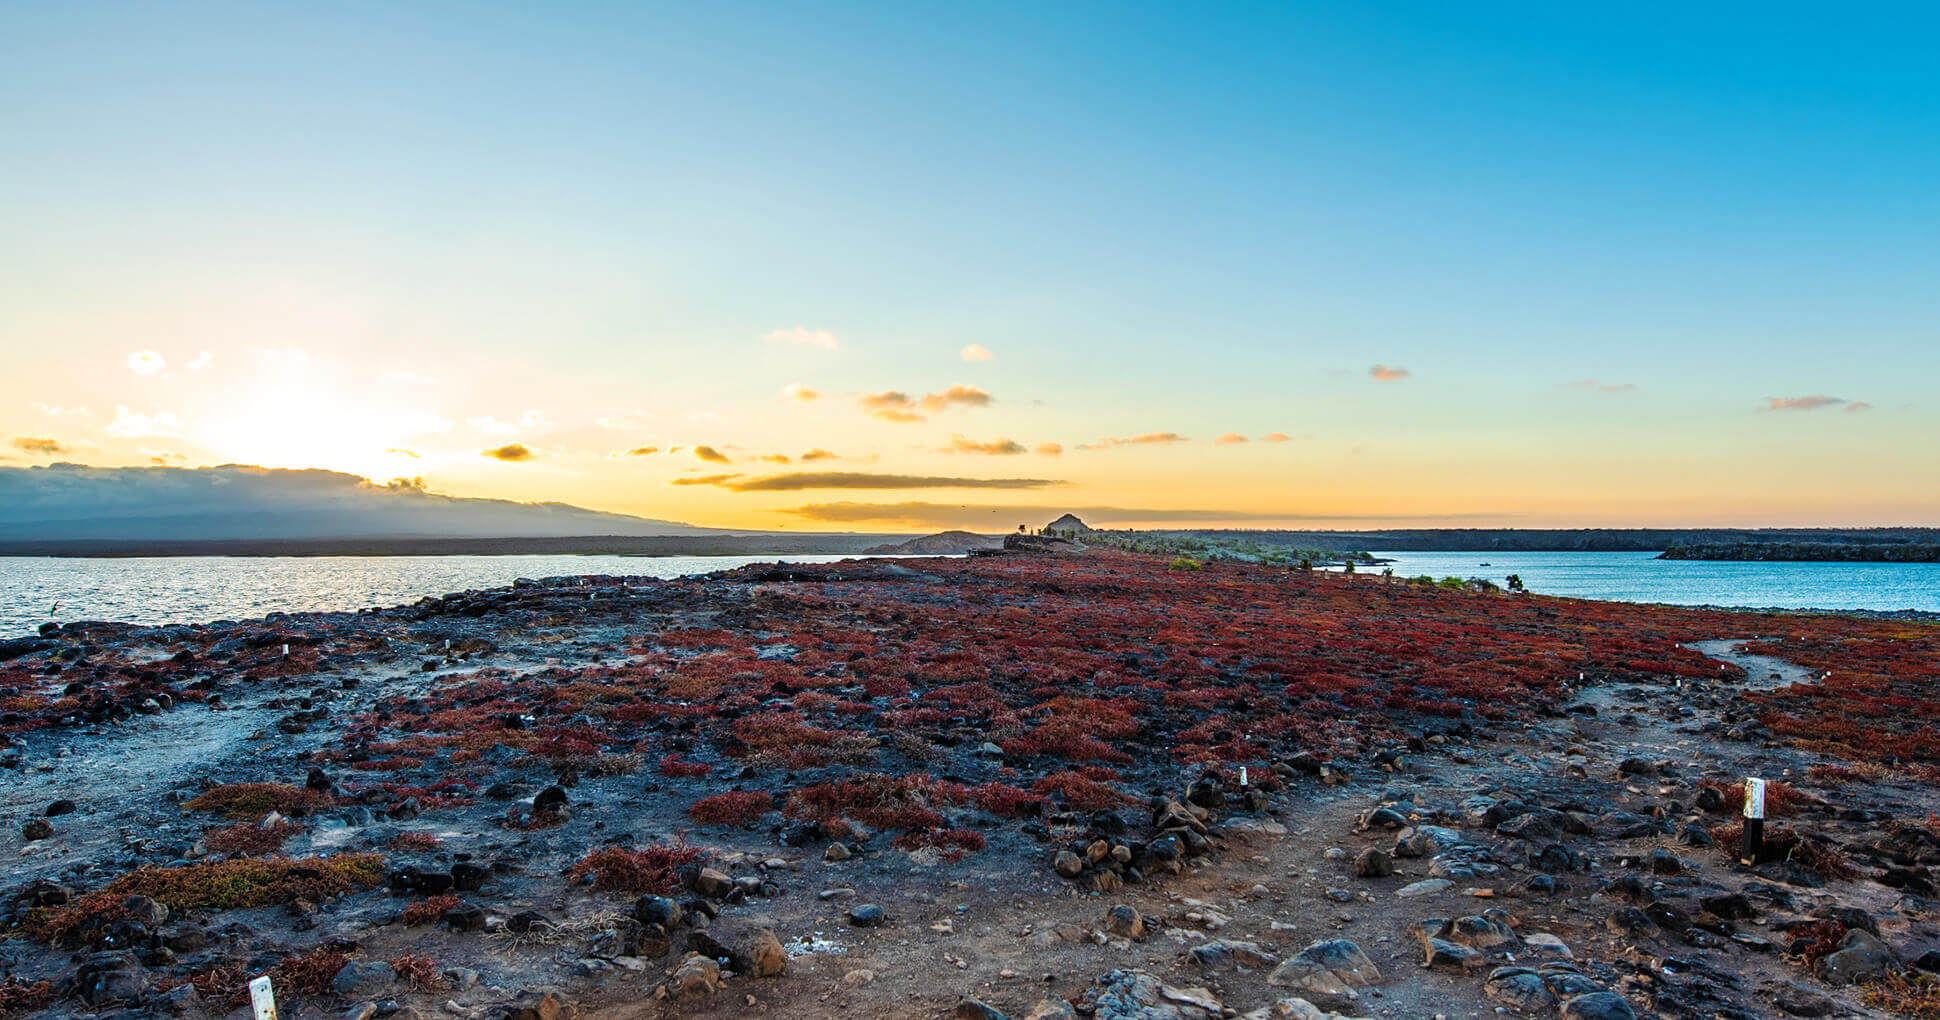 Sunset on North Seymour Island